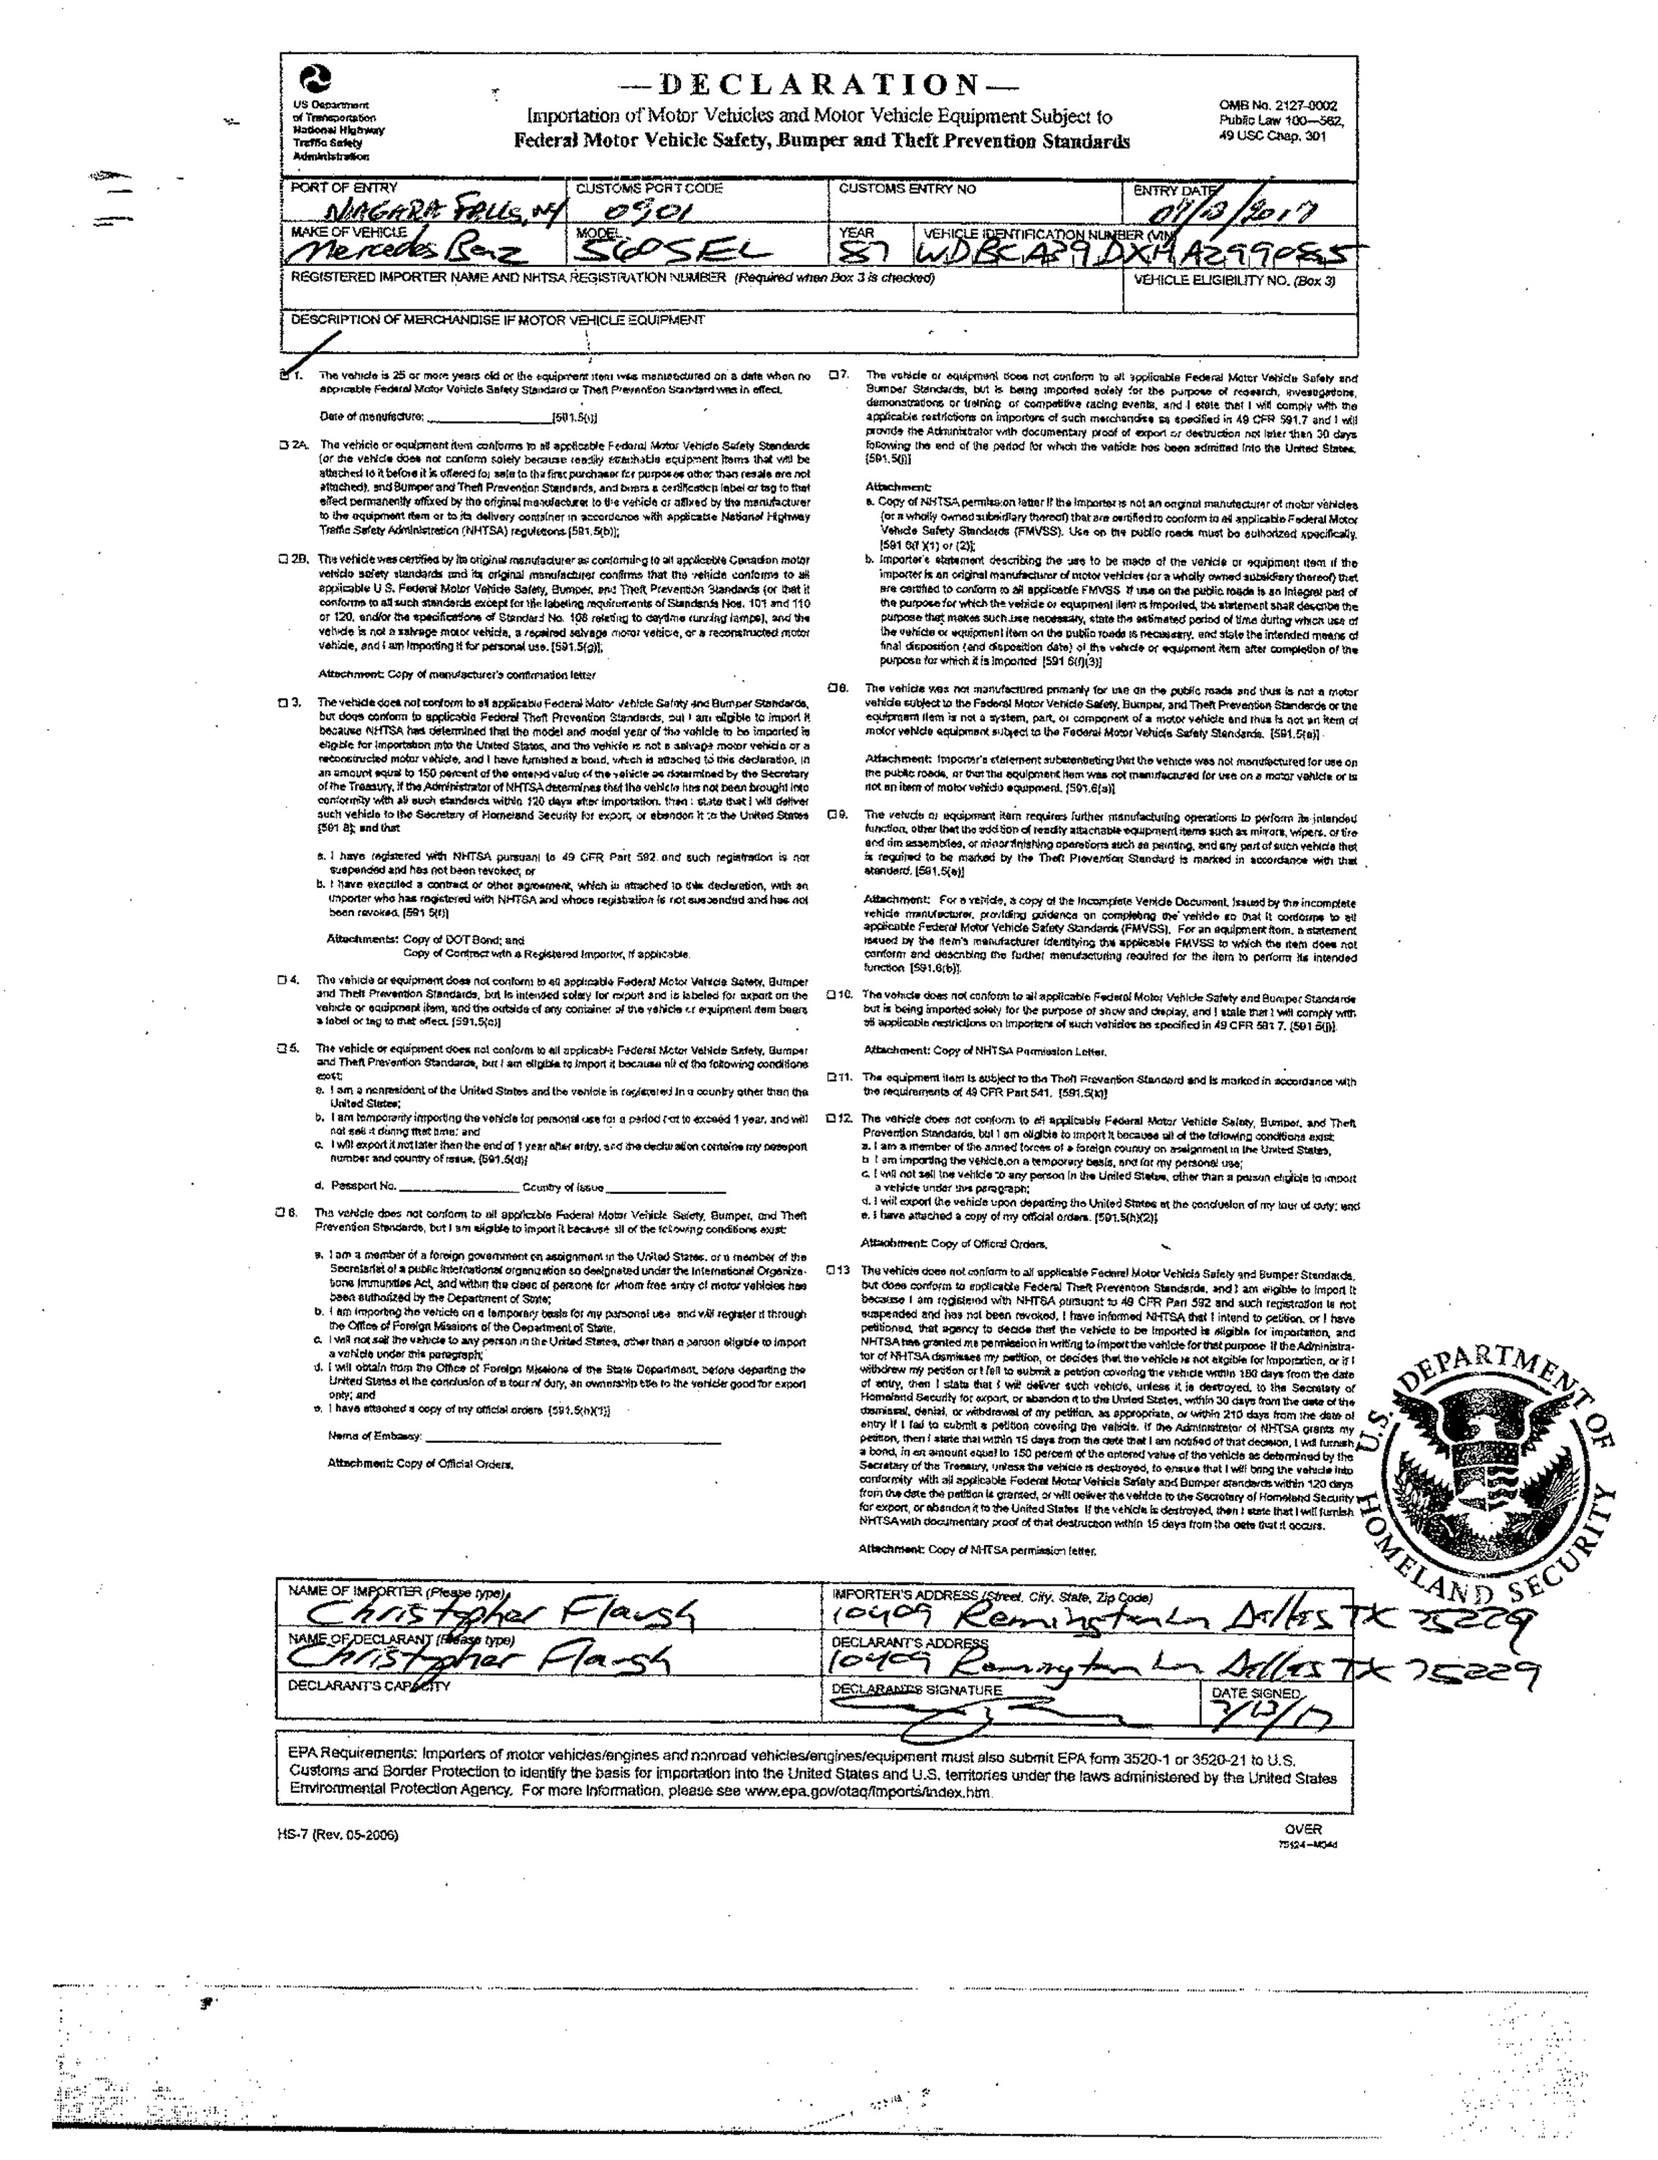 importation documents